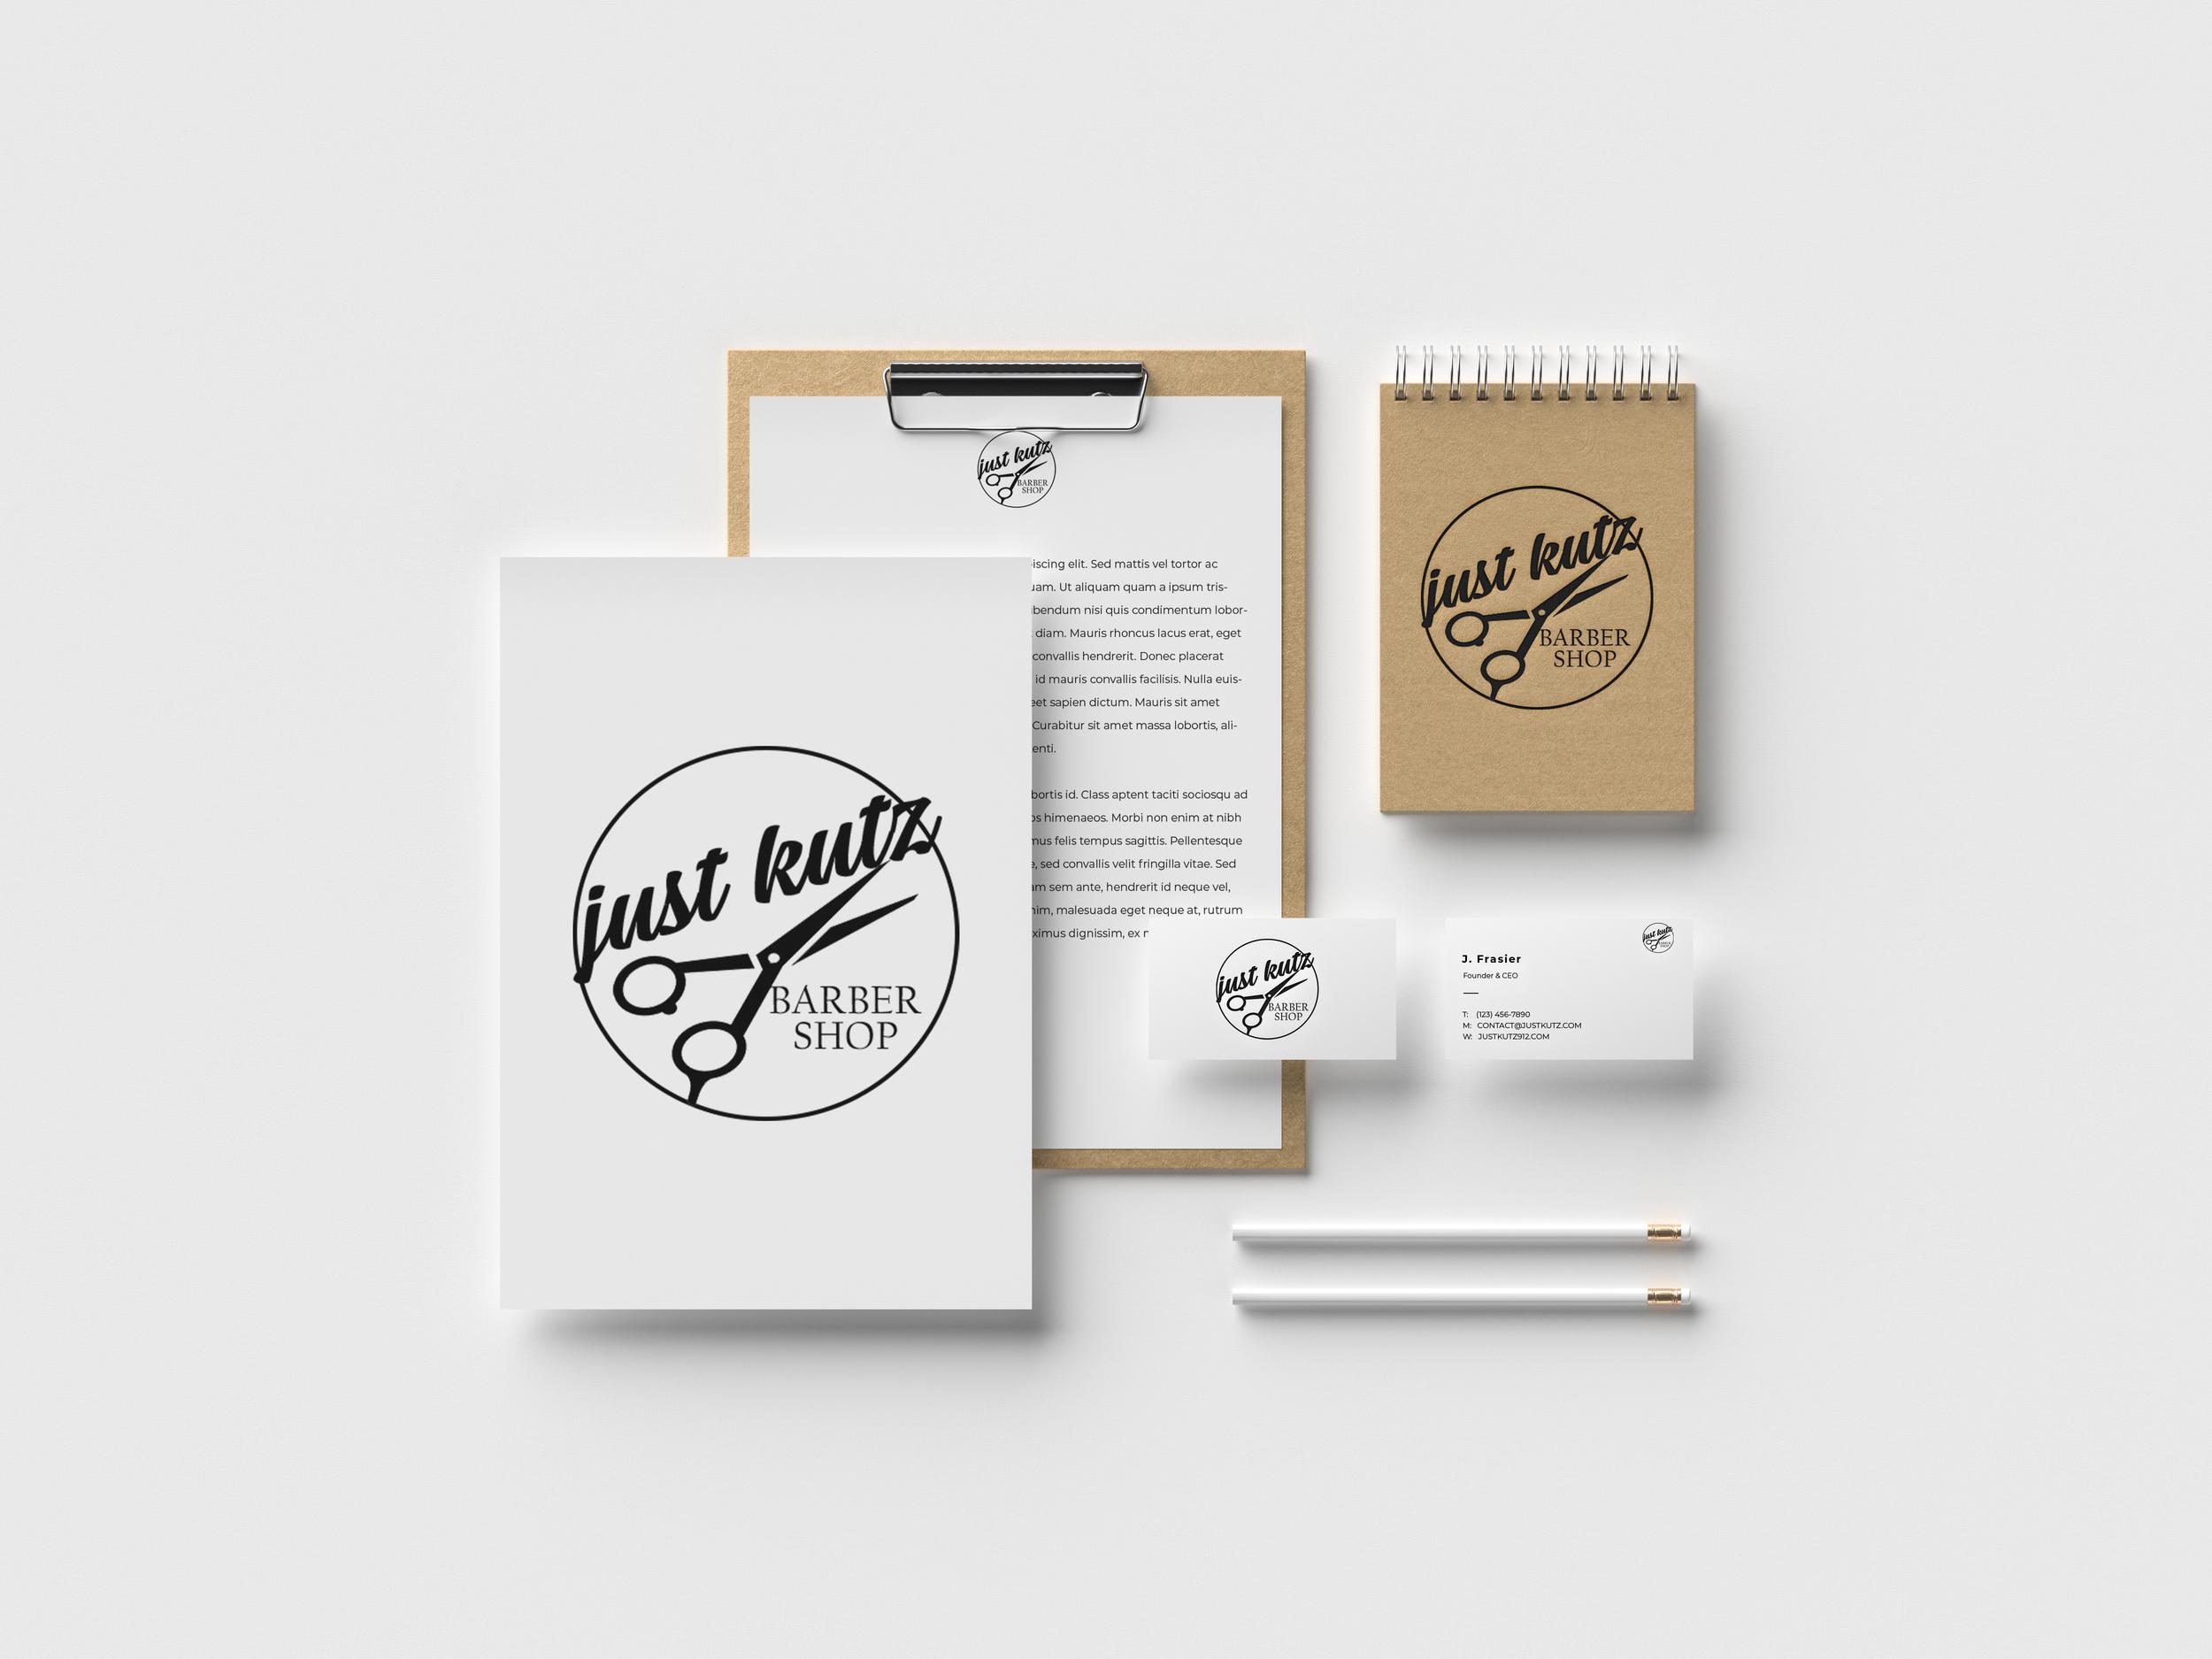 Just Kutz Hinesville Georgia Brand Development by Shelly C Studio | Shelly C Studio Savannah Georgia Graphic Design